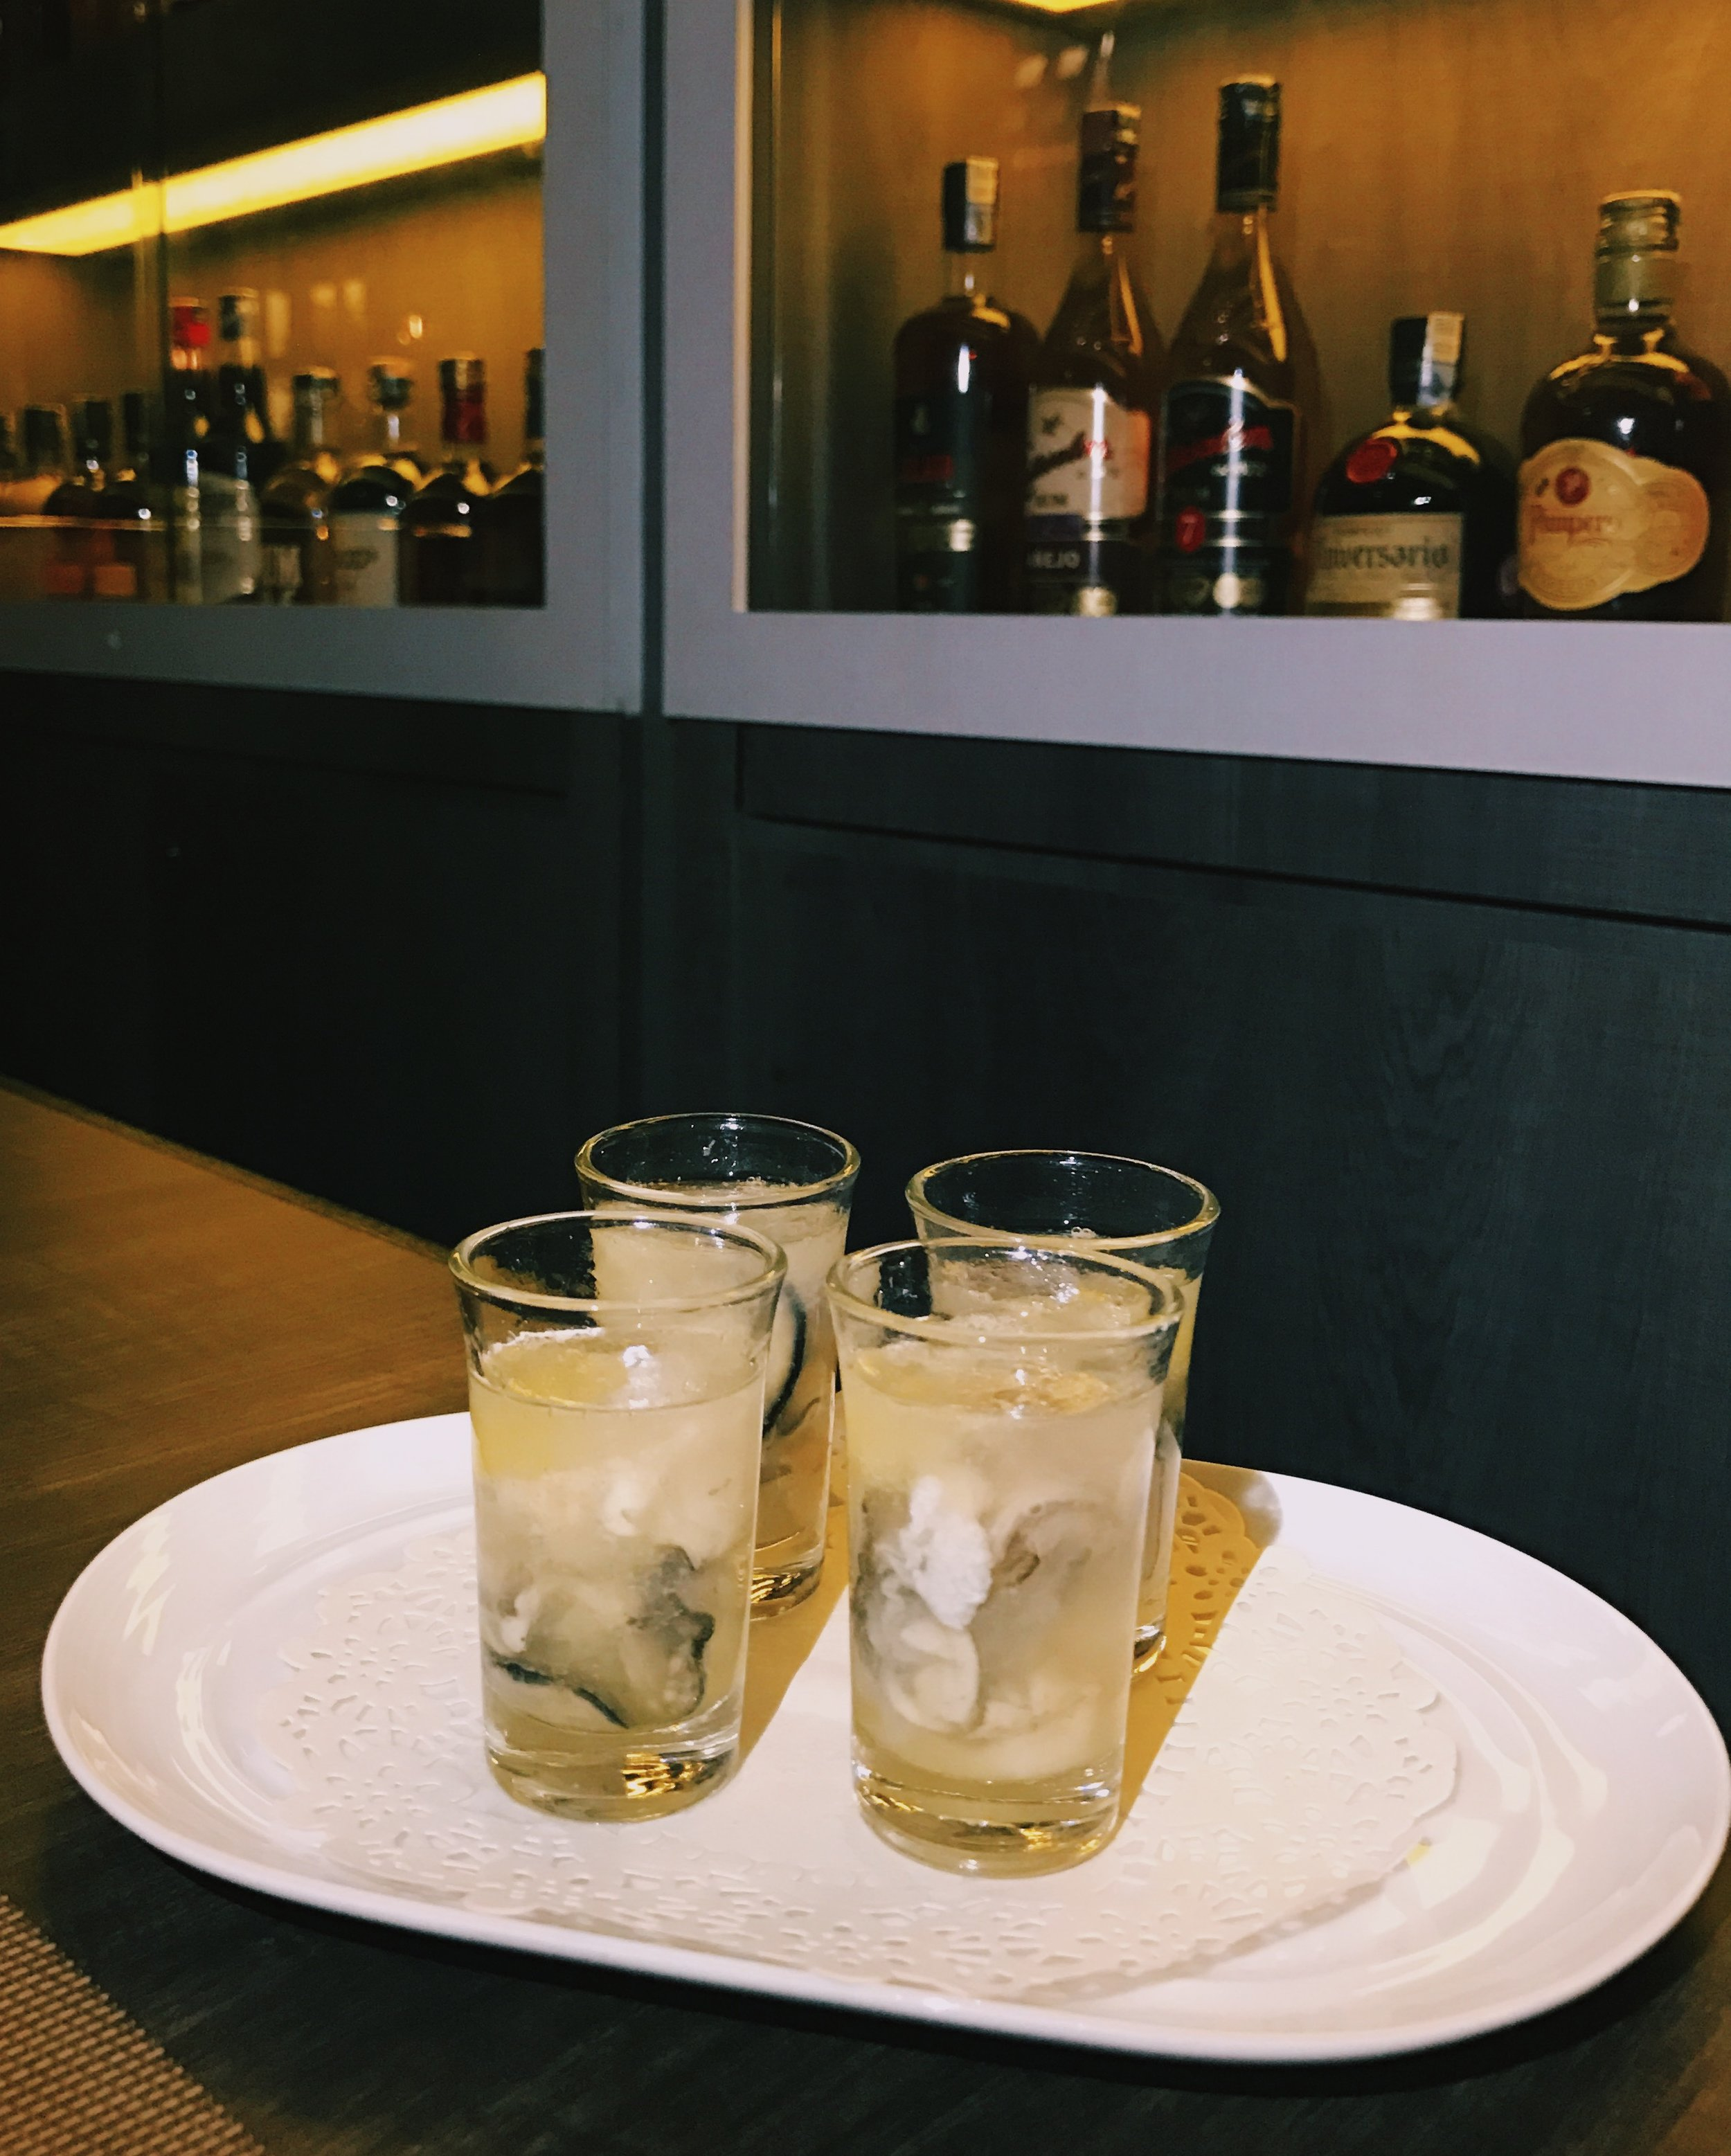 Rum Oyster Shots - RM28